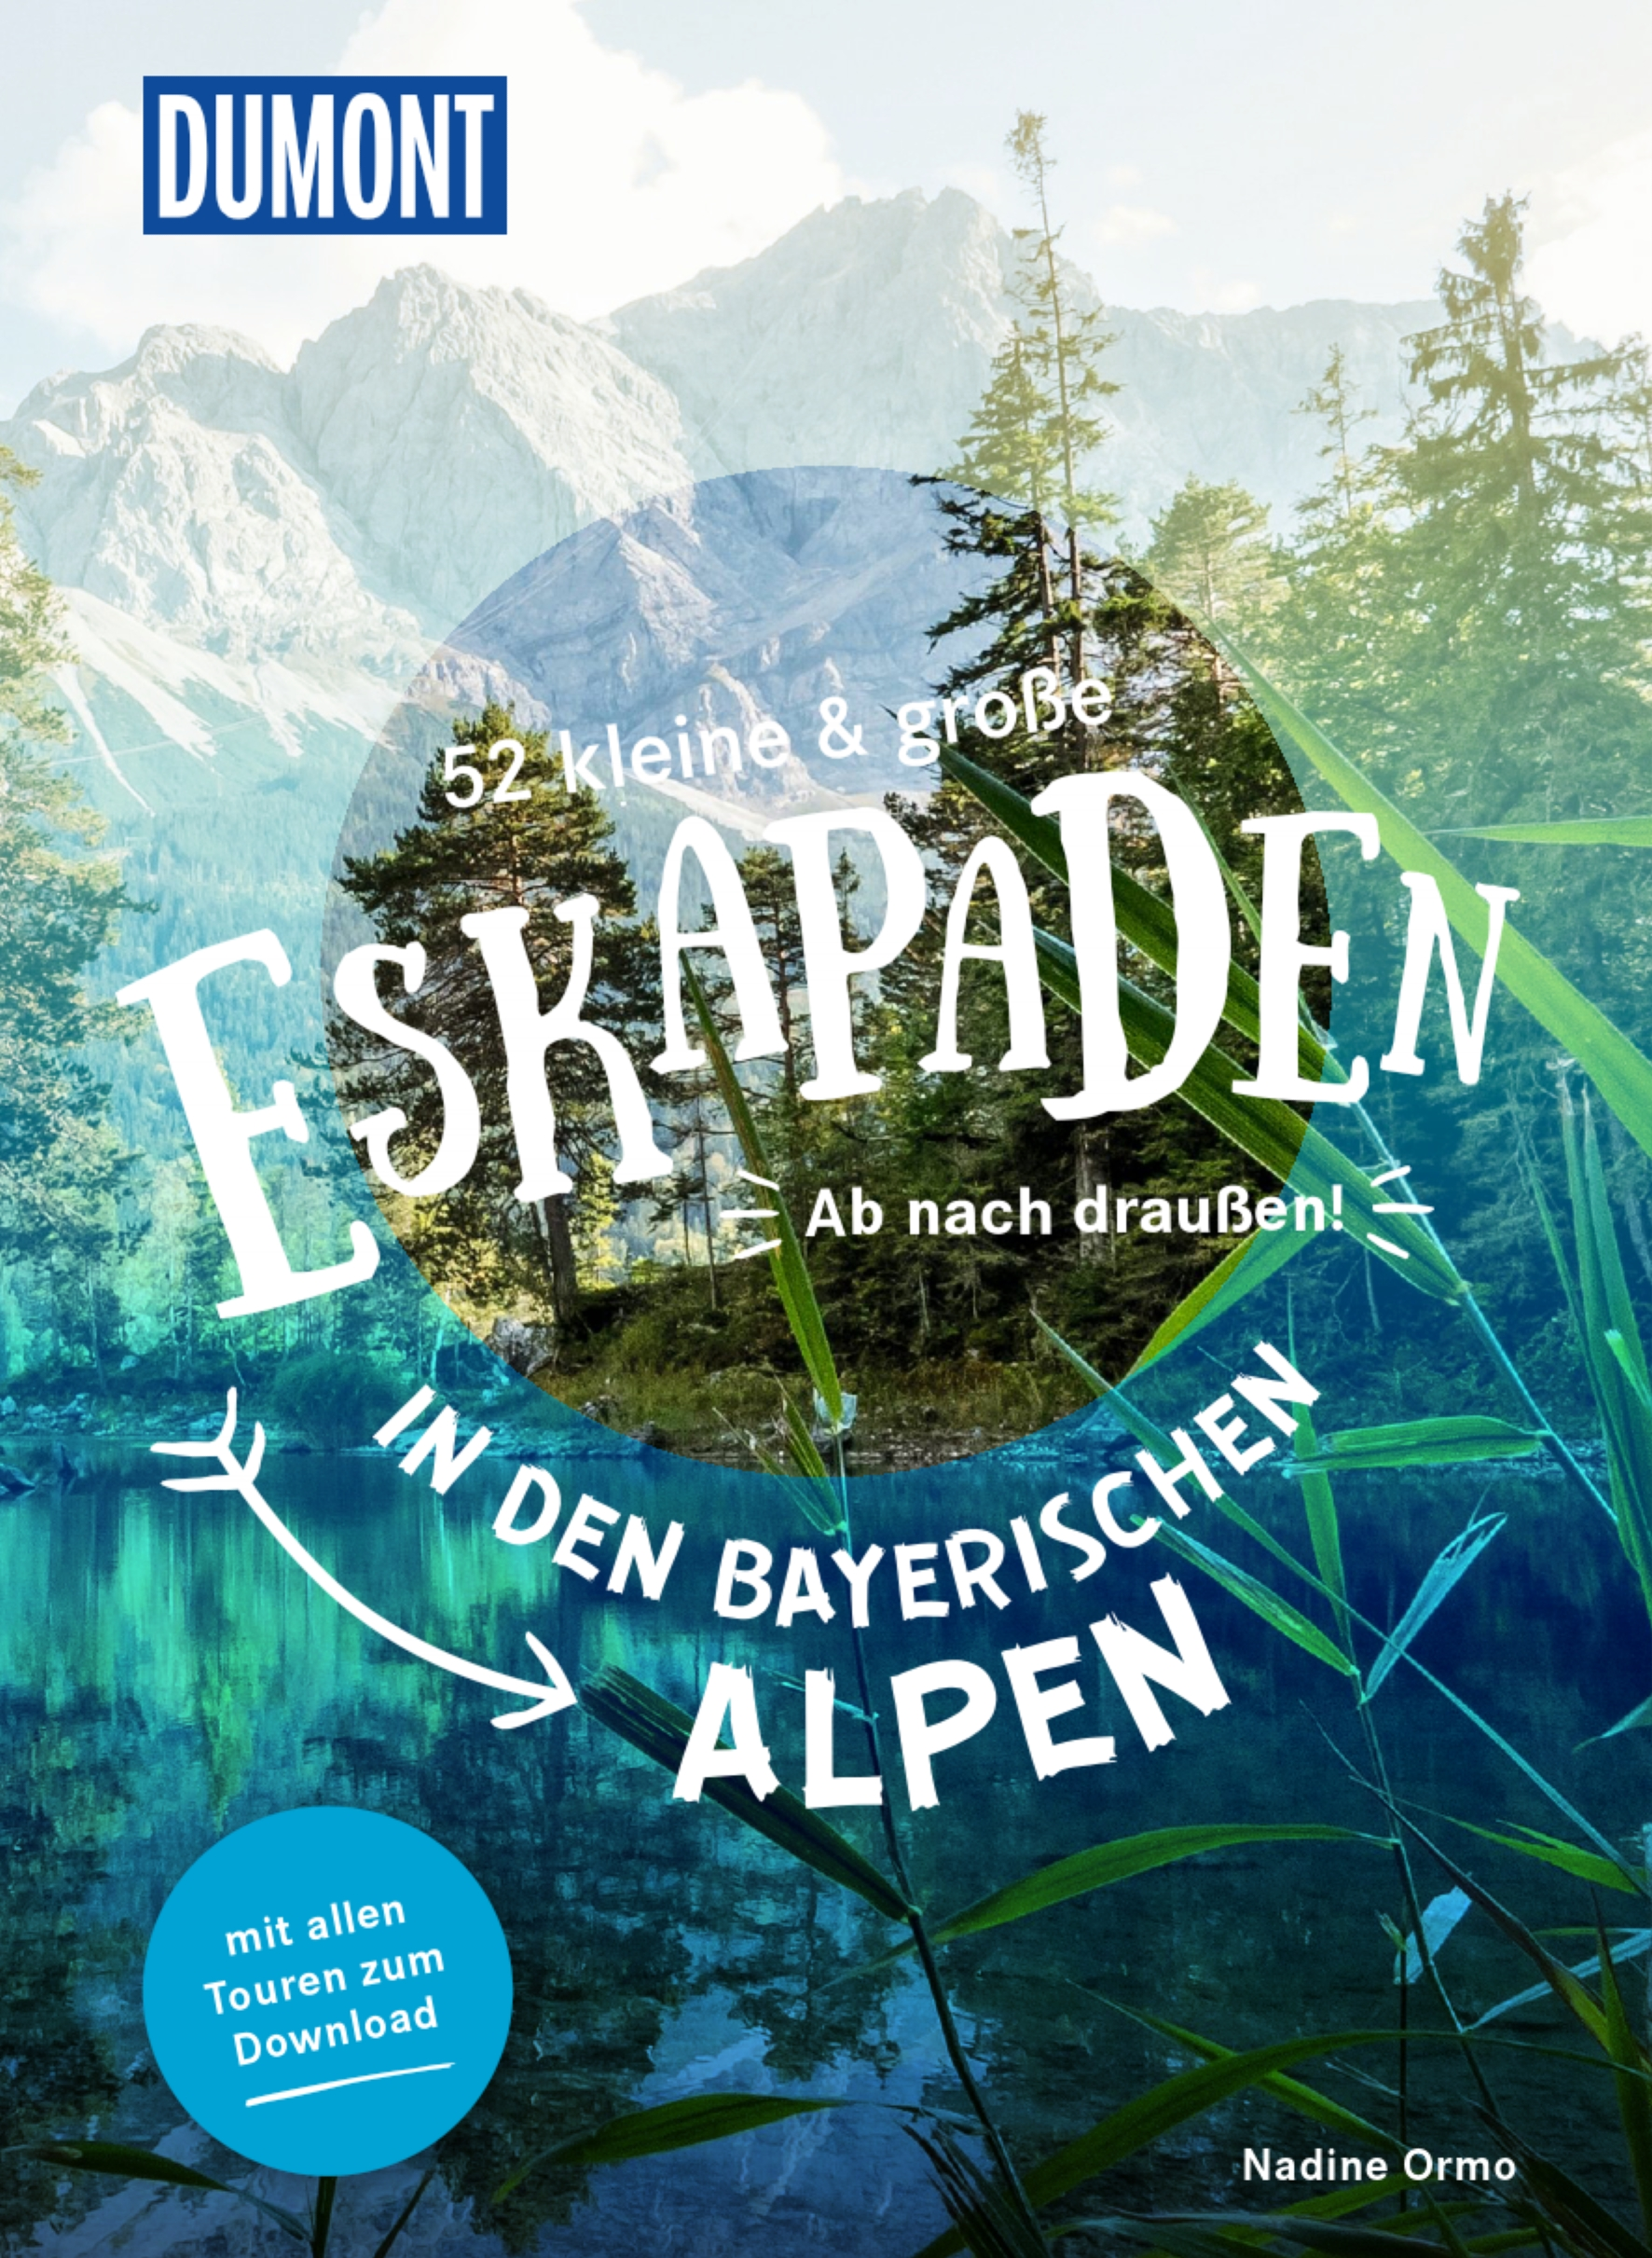 DuMont Eskapaden - Bayerische Alpen (Cover)